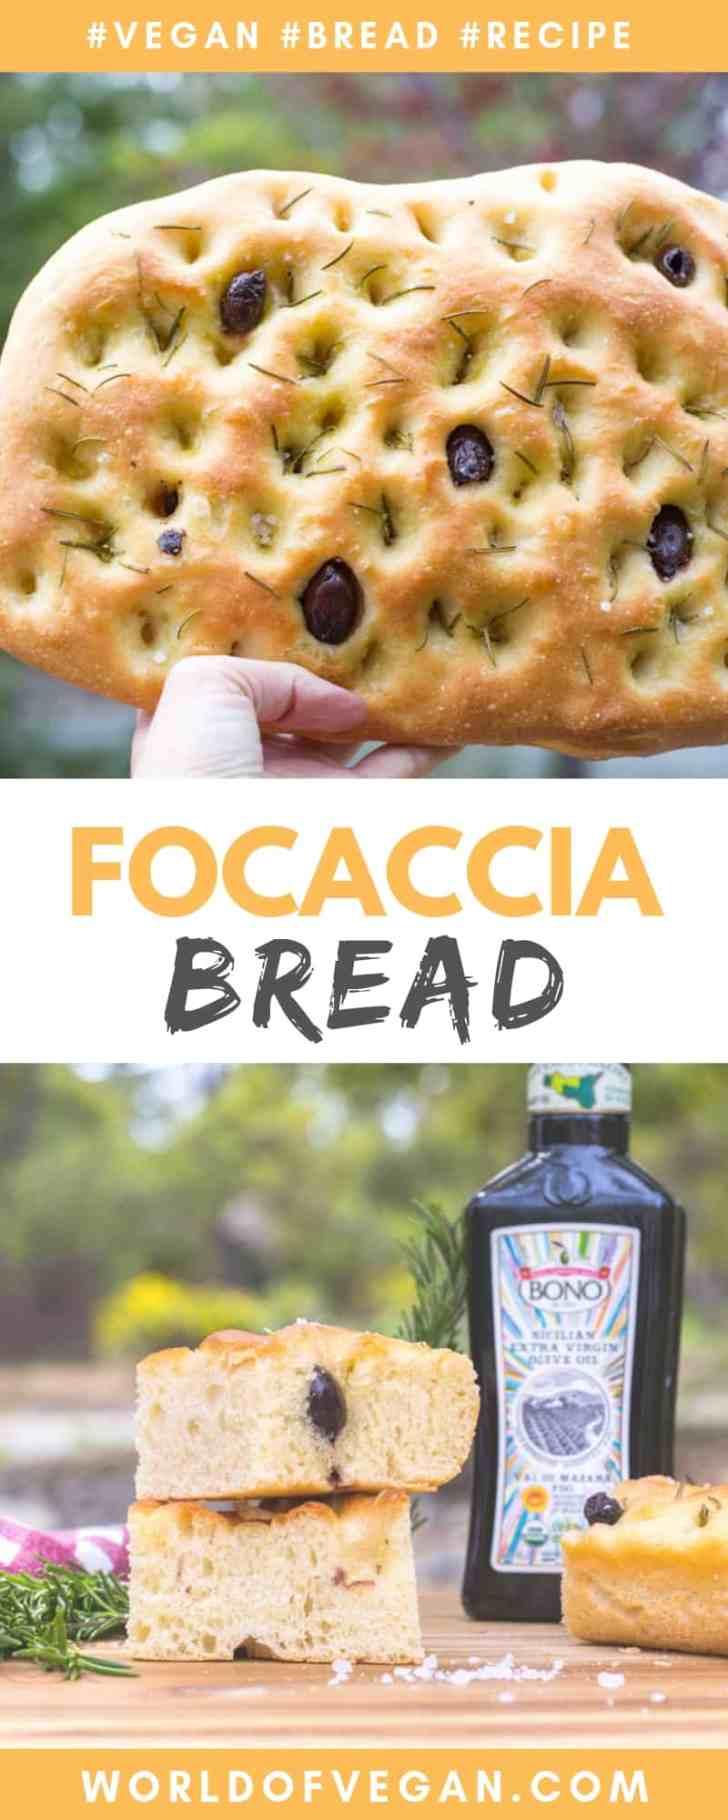 Easy Vegan Focaccia Bread Recipe | World of Vegan #vegan #focaccia #bread #diy #baking